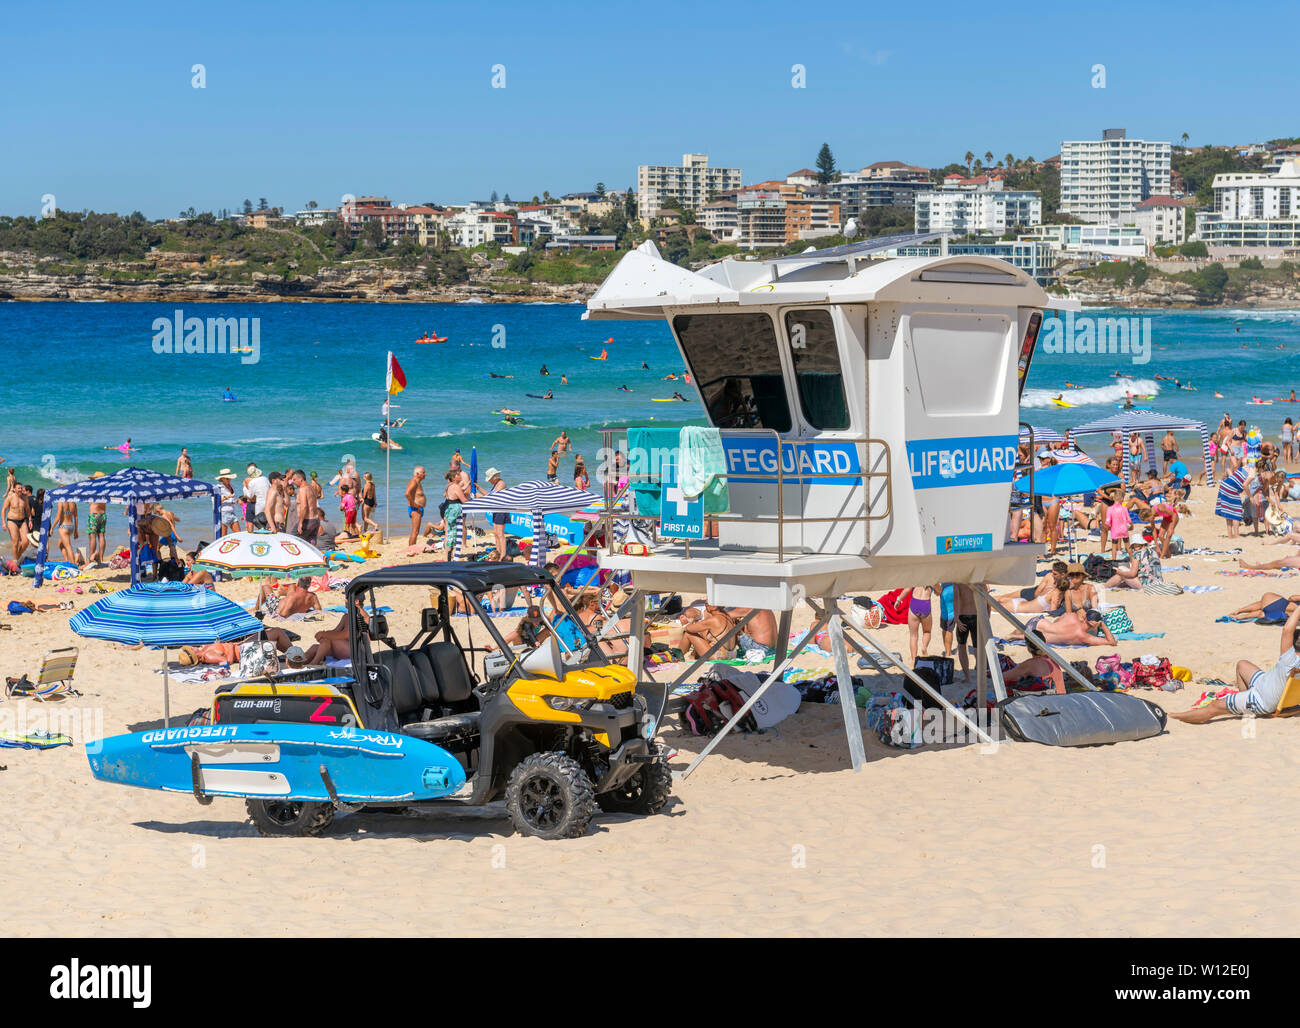 Lifeguard Hut On Bondi Beach Sydney New South Wales Australia Stock Photo Alamy